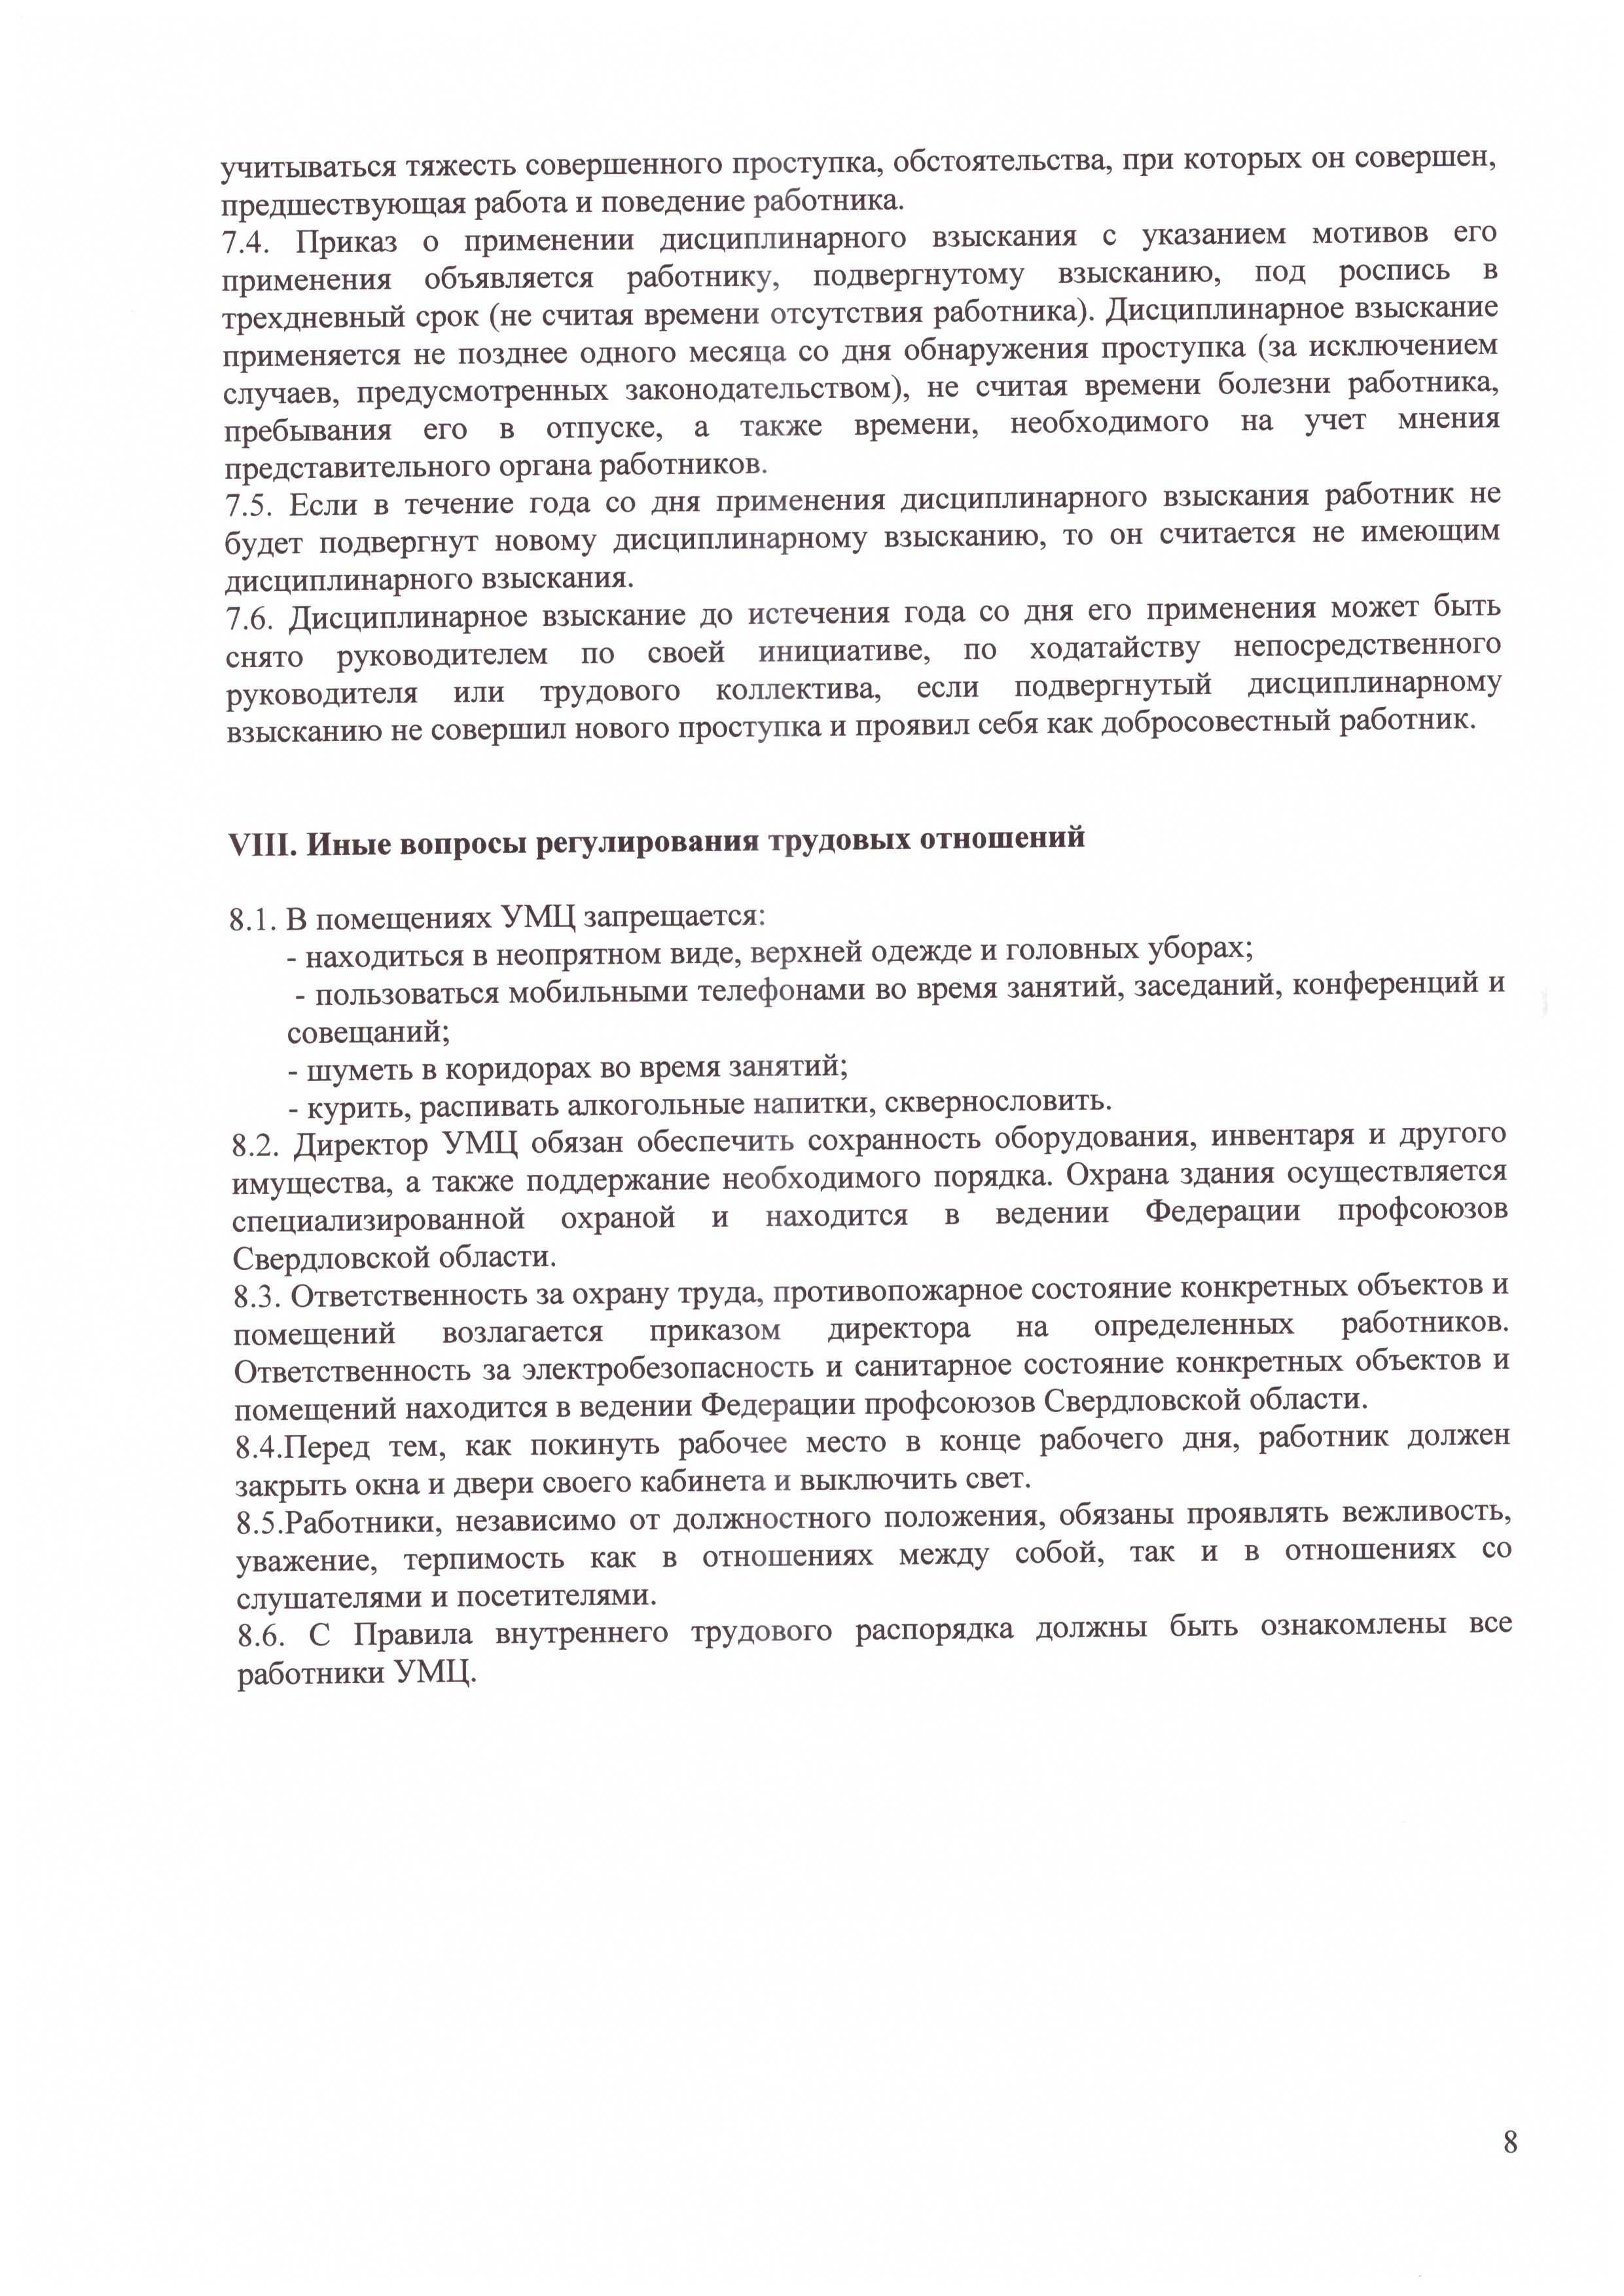 SCAN_правила внутр.распор_Страница_8